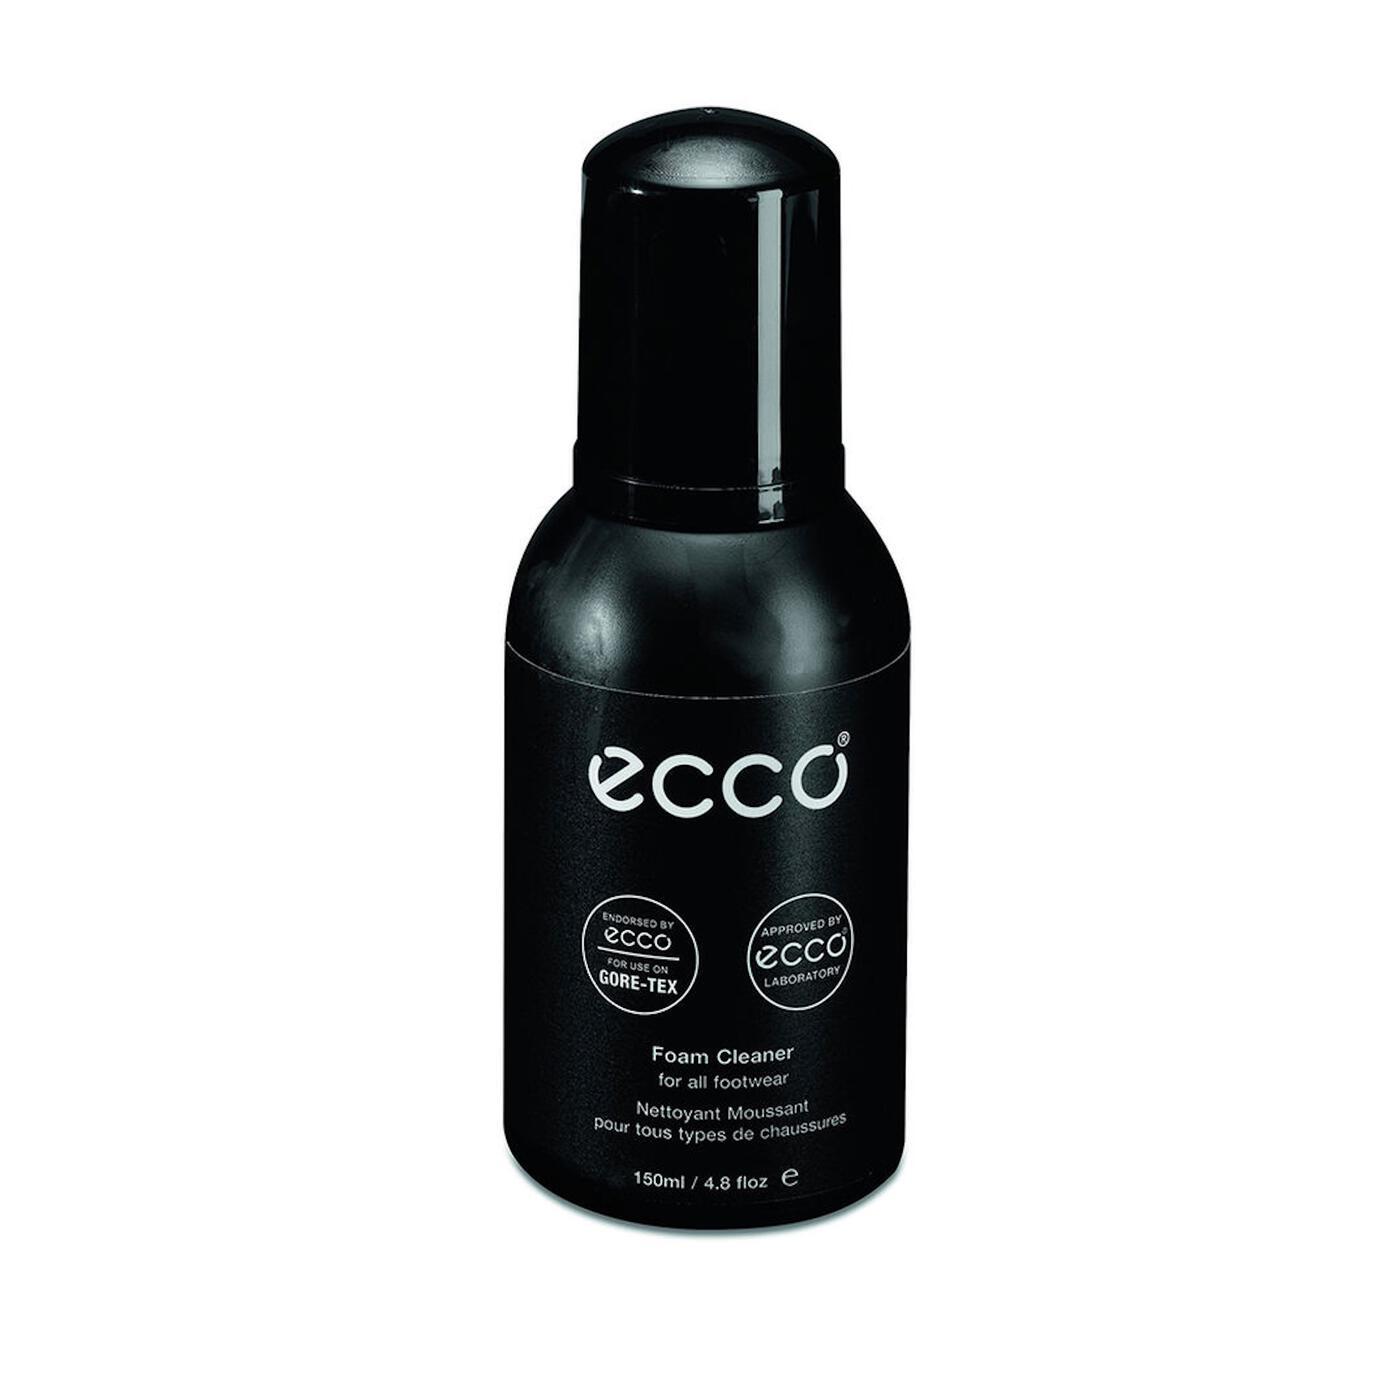 ECCO Foam Cleaner